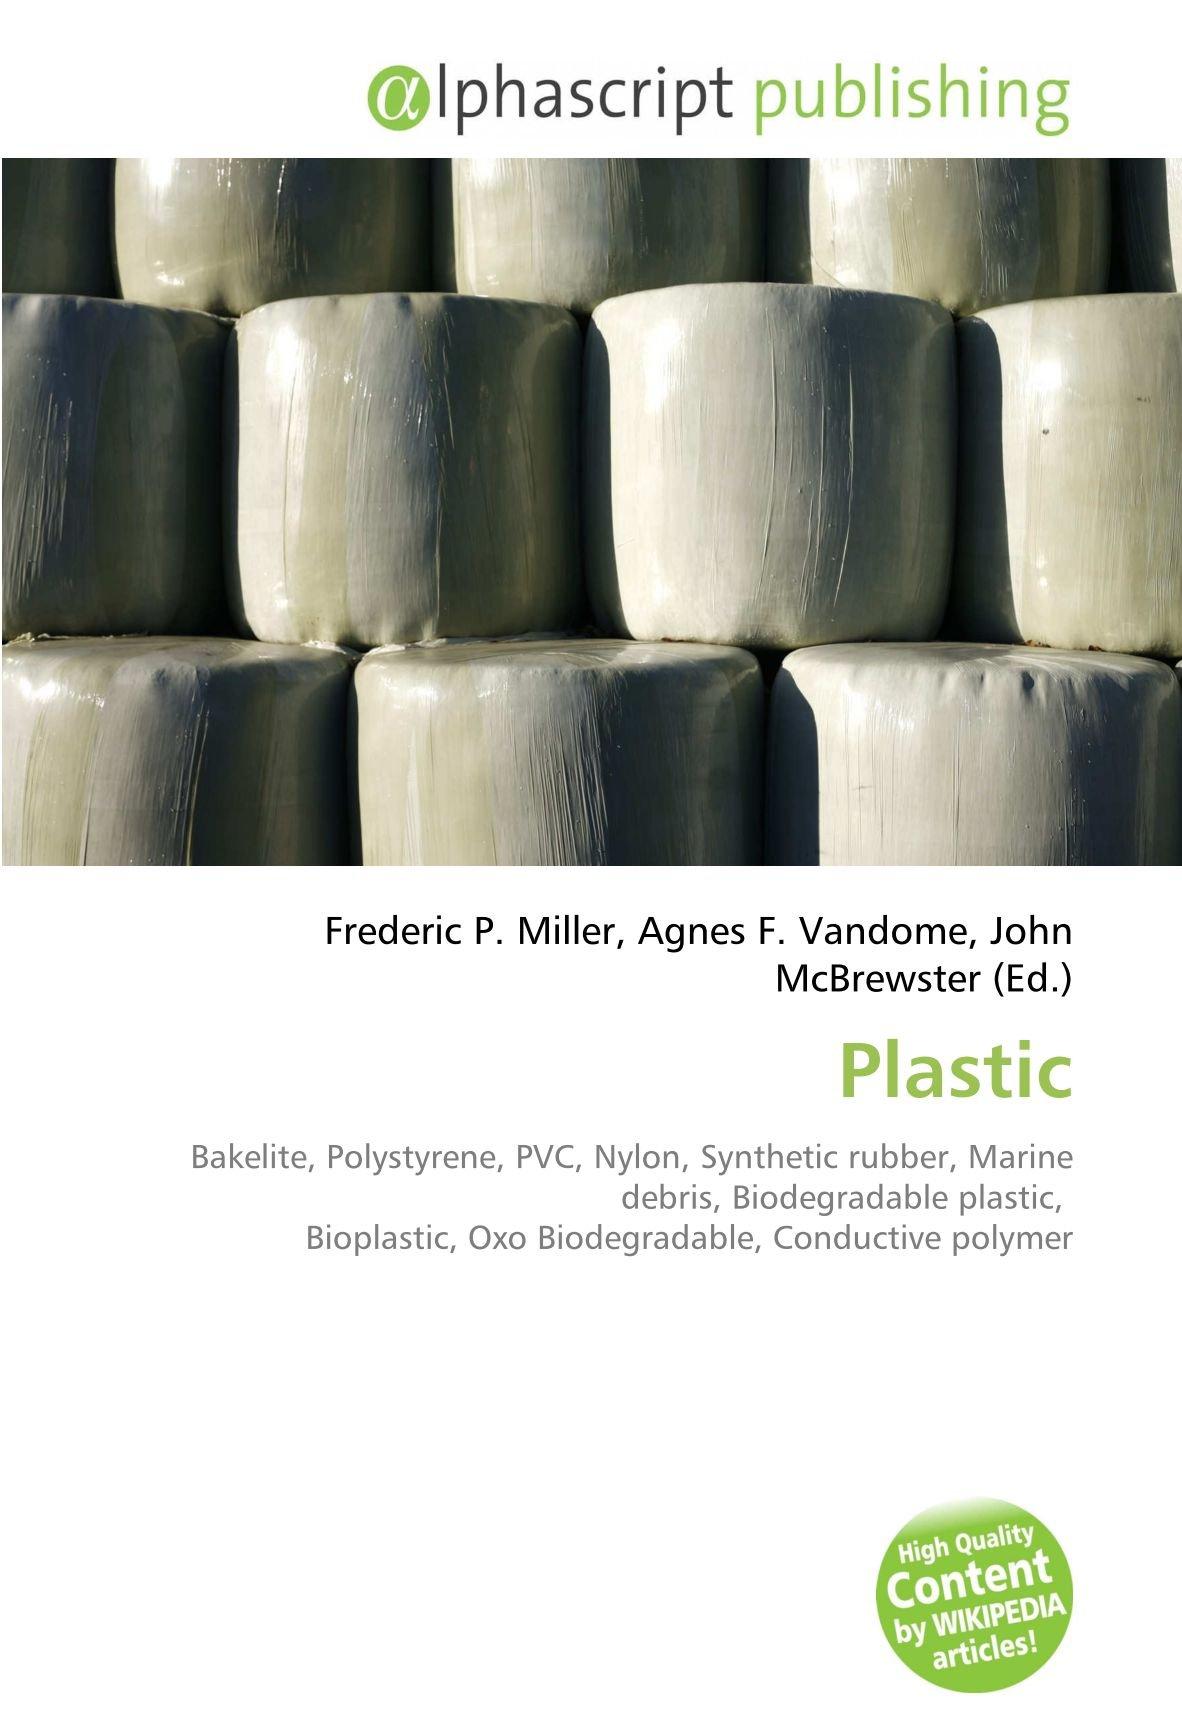 Plastic: Bakelite, Polystyrene, PVC, Nylon, Synthetic rubber ...